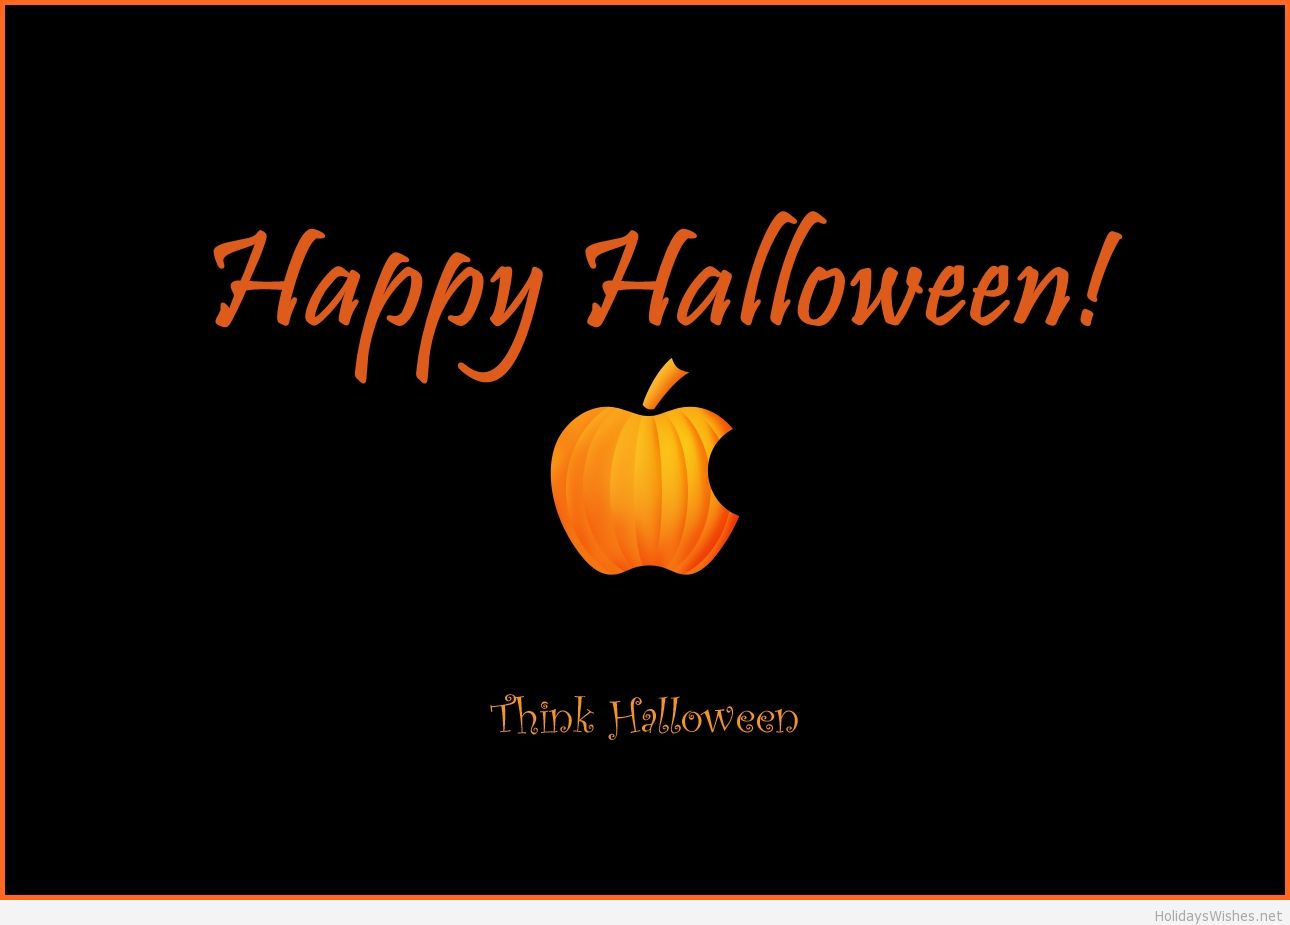 Happy-Halloween-Apple-image